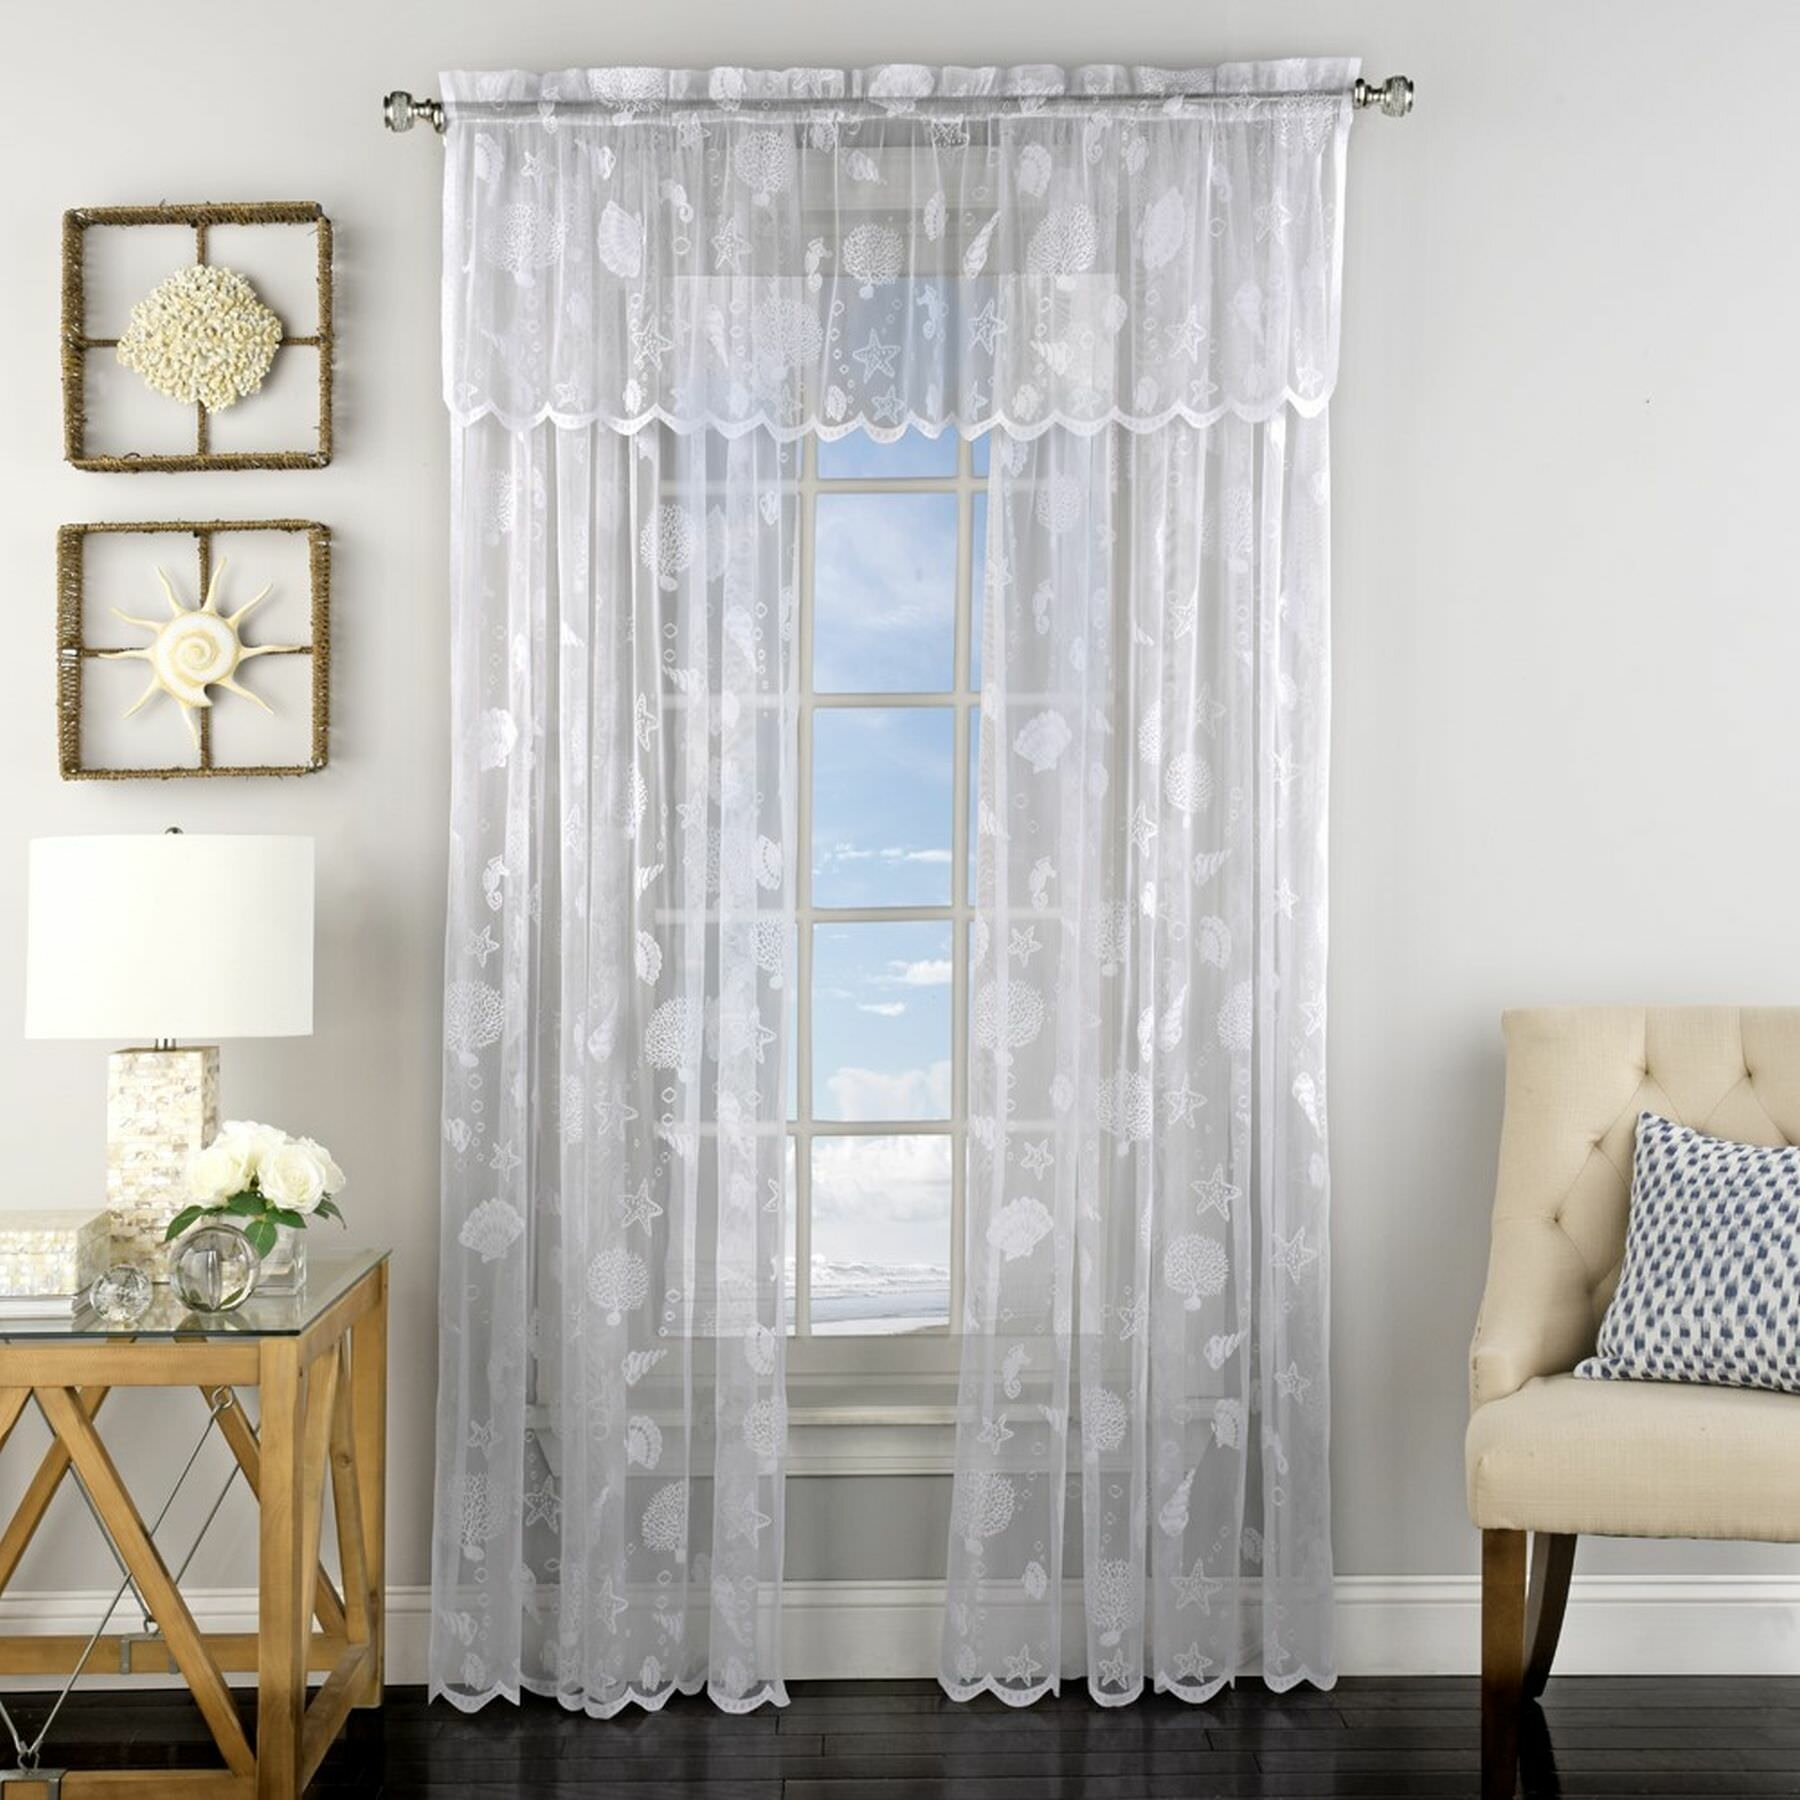 Highland Dunes Antonella Corales De Marina Knitted Jacquard Lace Window Semi Sheer Curtain Panels Reviews Wayfair Ca